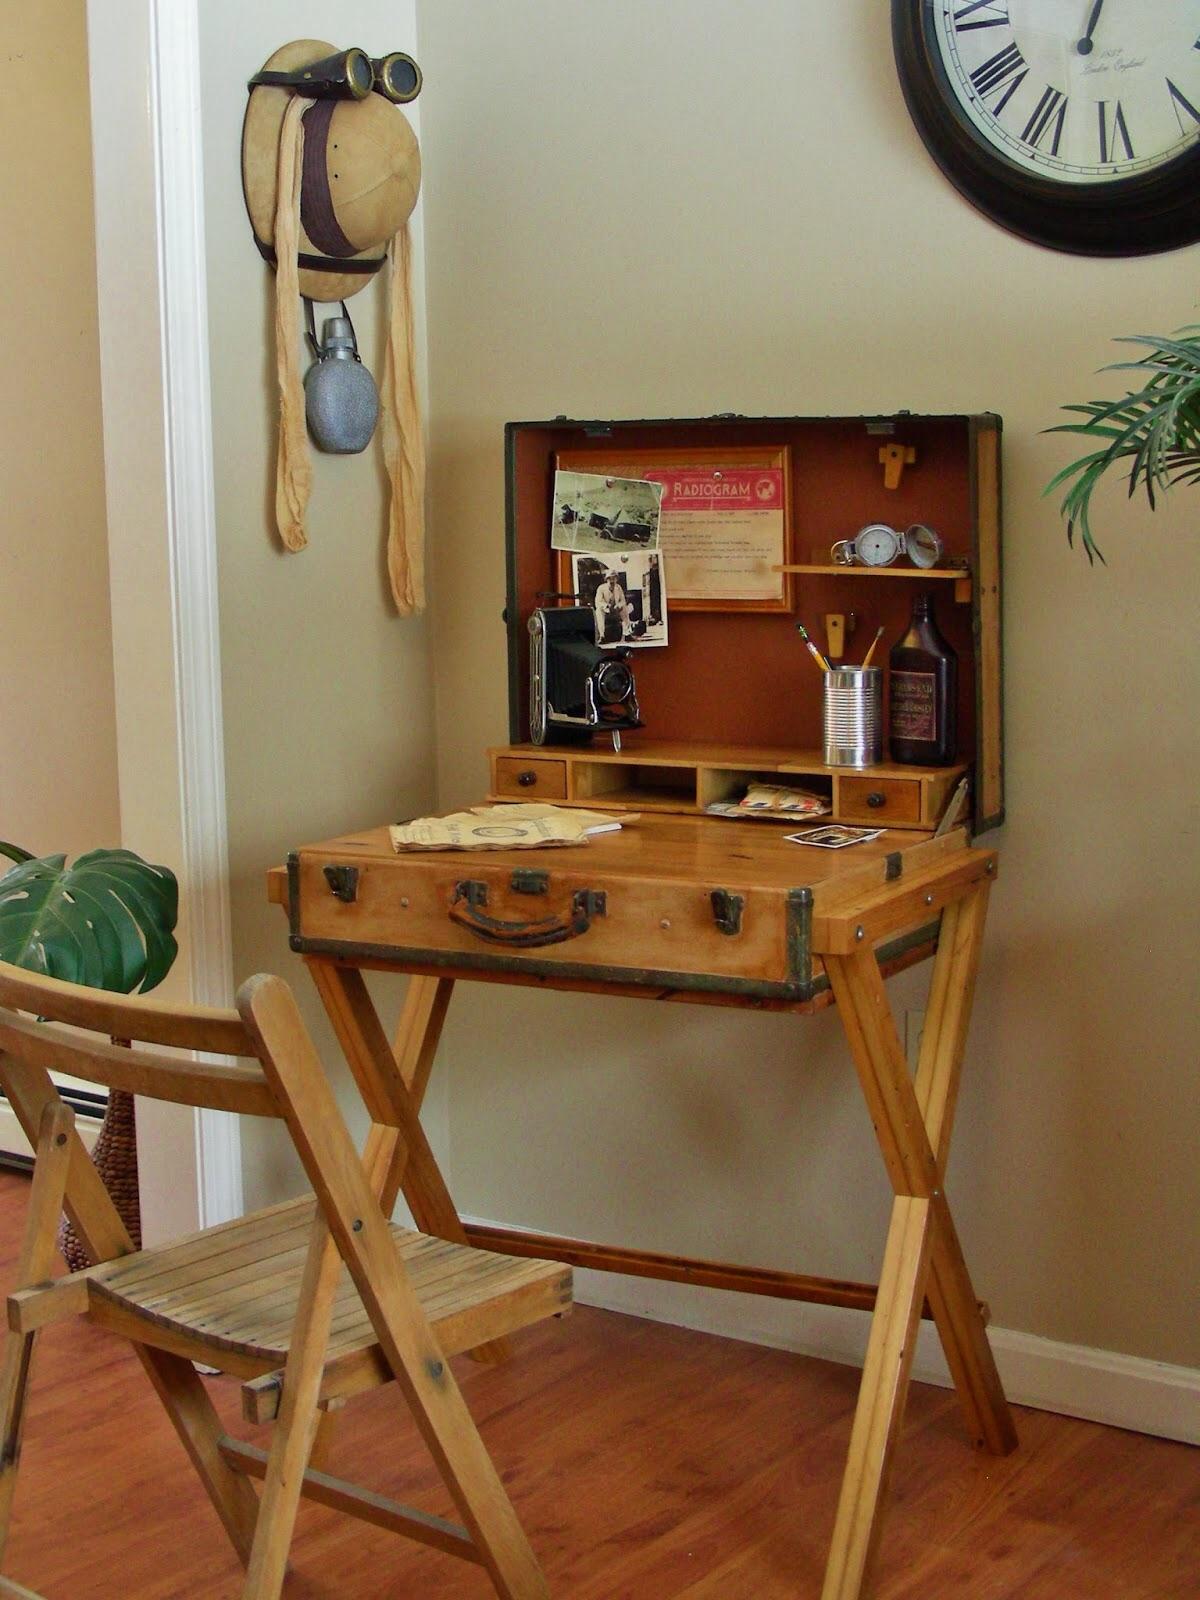 old office chair and table lawn chairs usa escrivaninhas criativas joia de casa